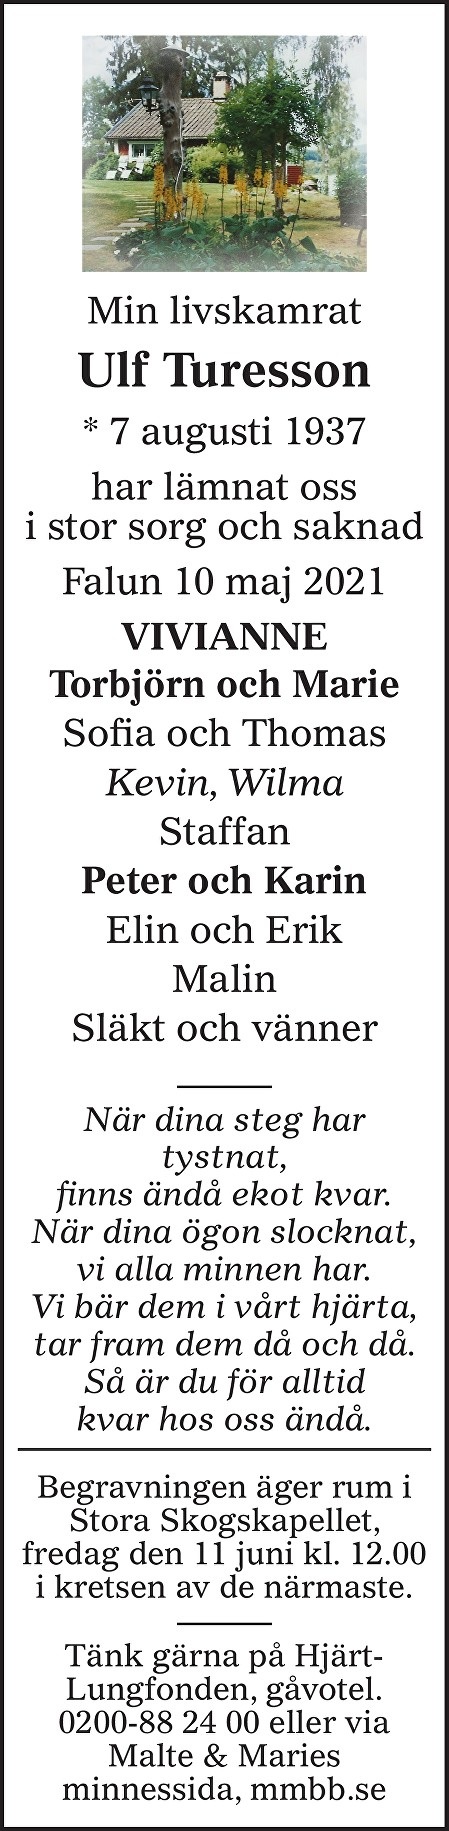 Ulf Turesson Death notice